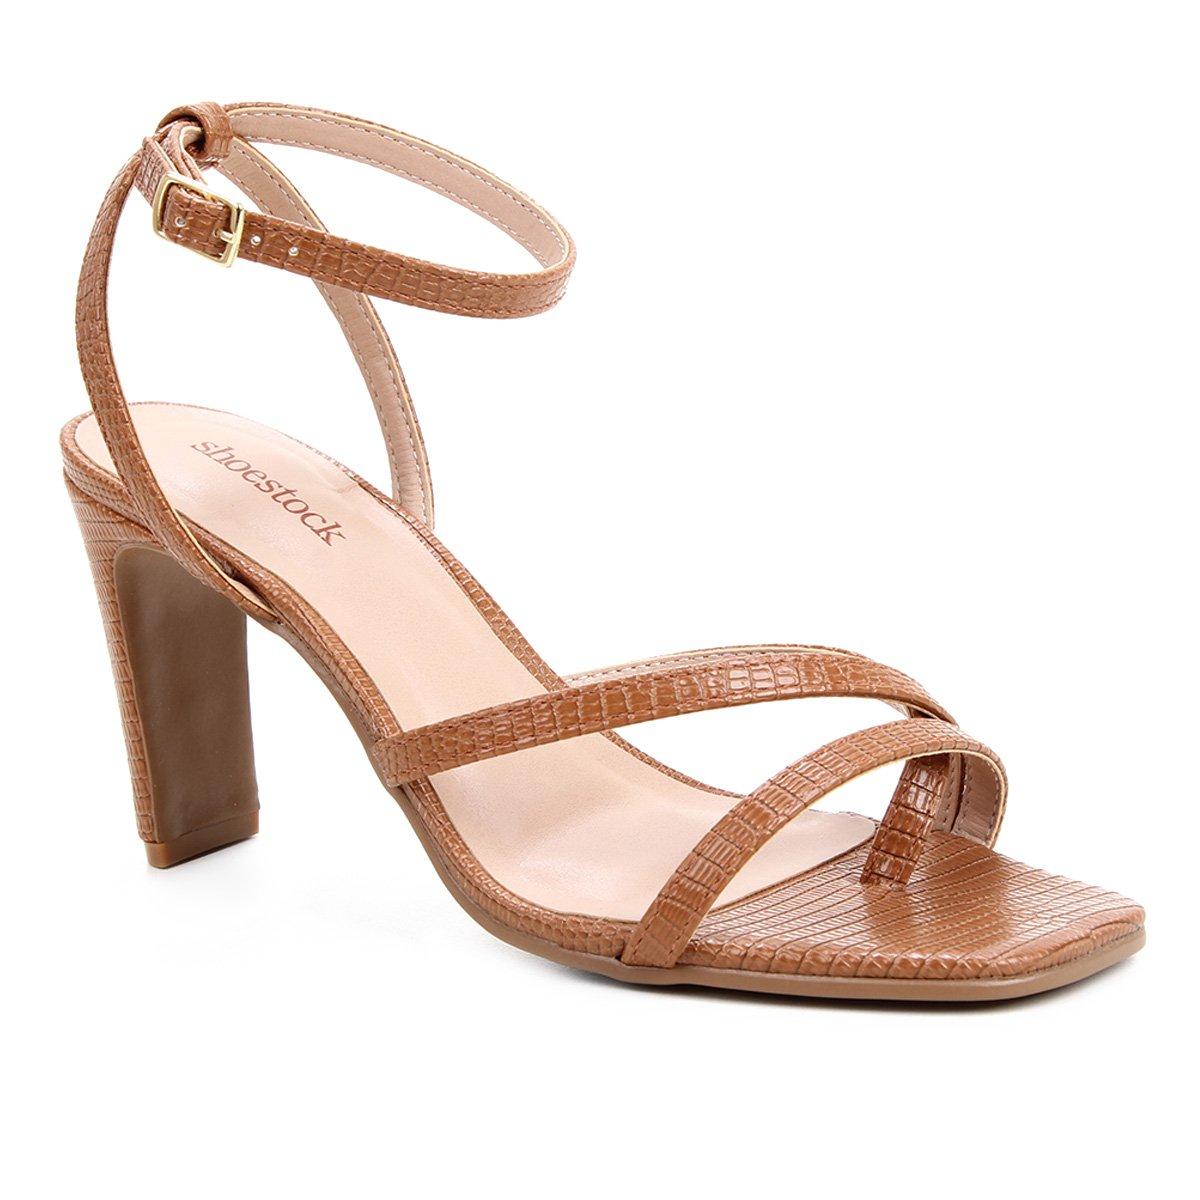 Sandália Shoestock Bico Quadrado Salto Alto Feminina